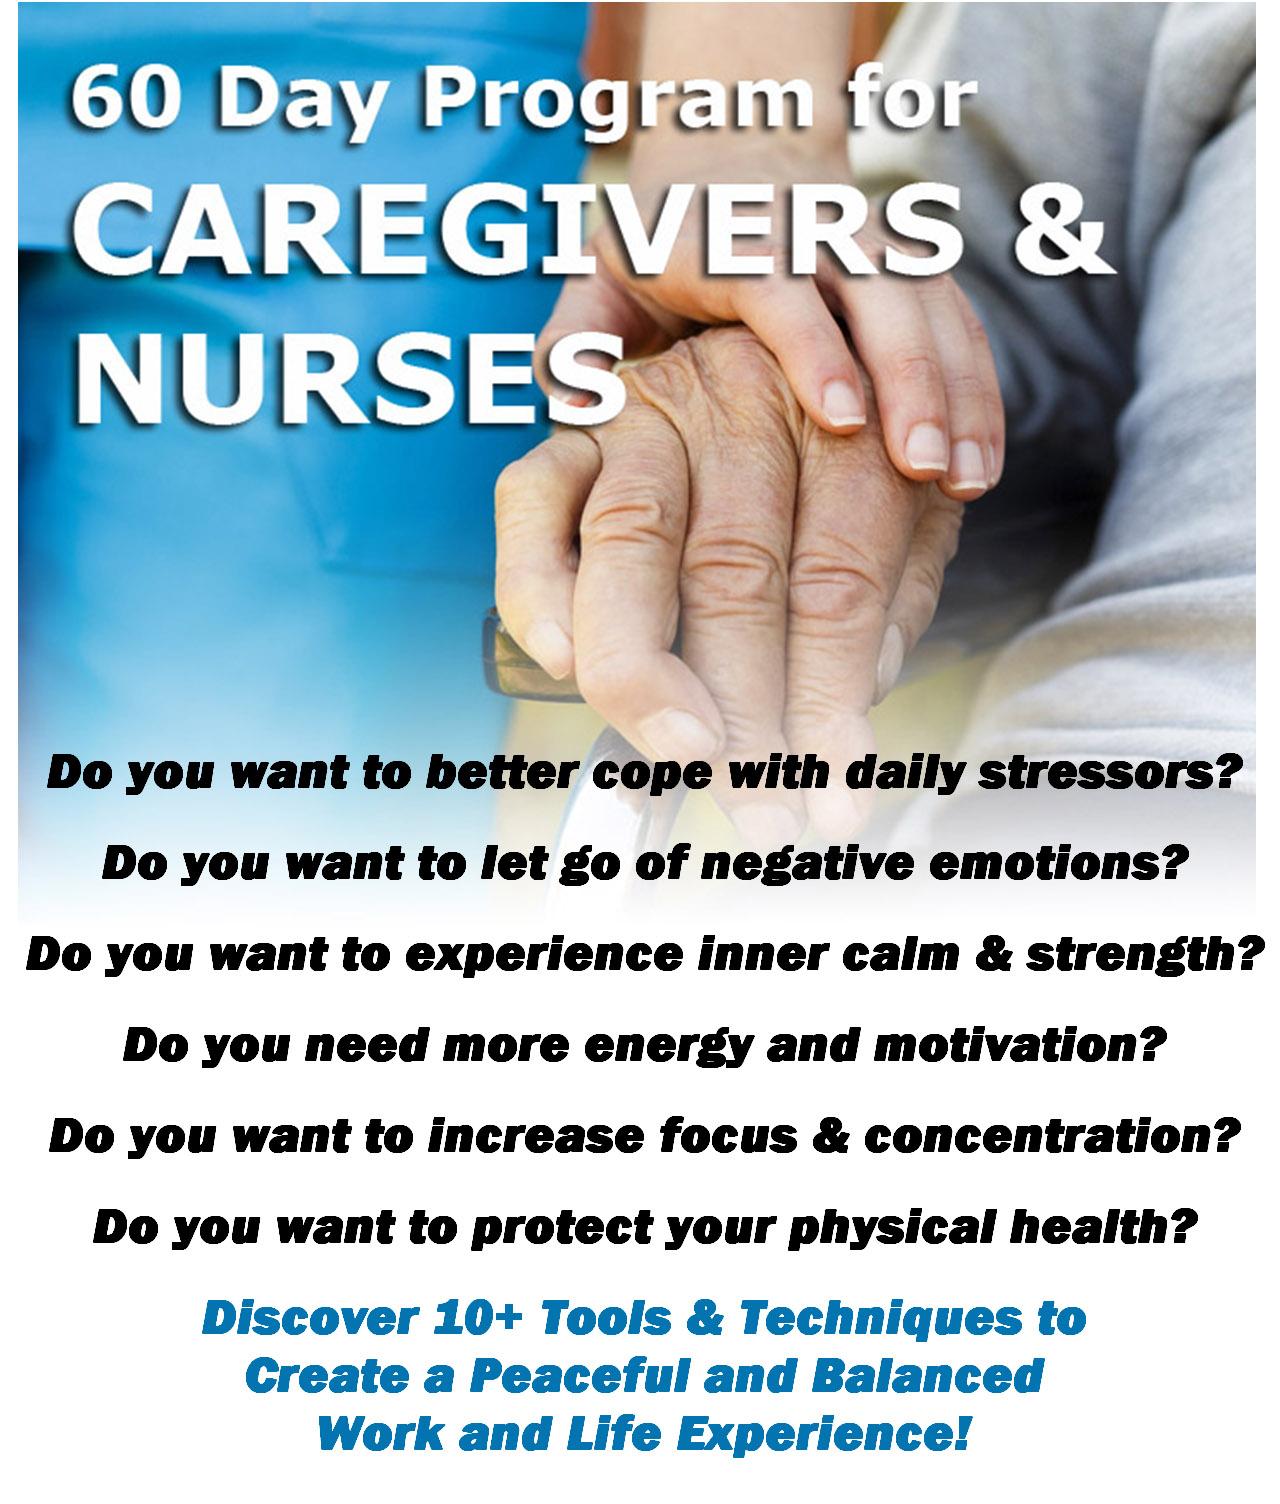 Caregivers and Nurses Program for Stress Reduction